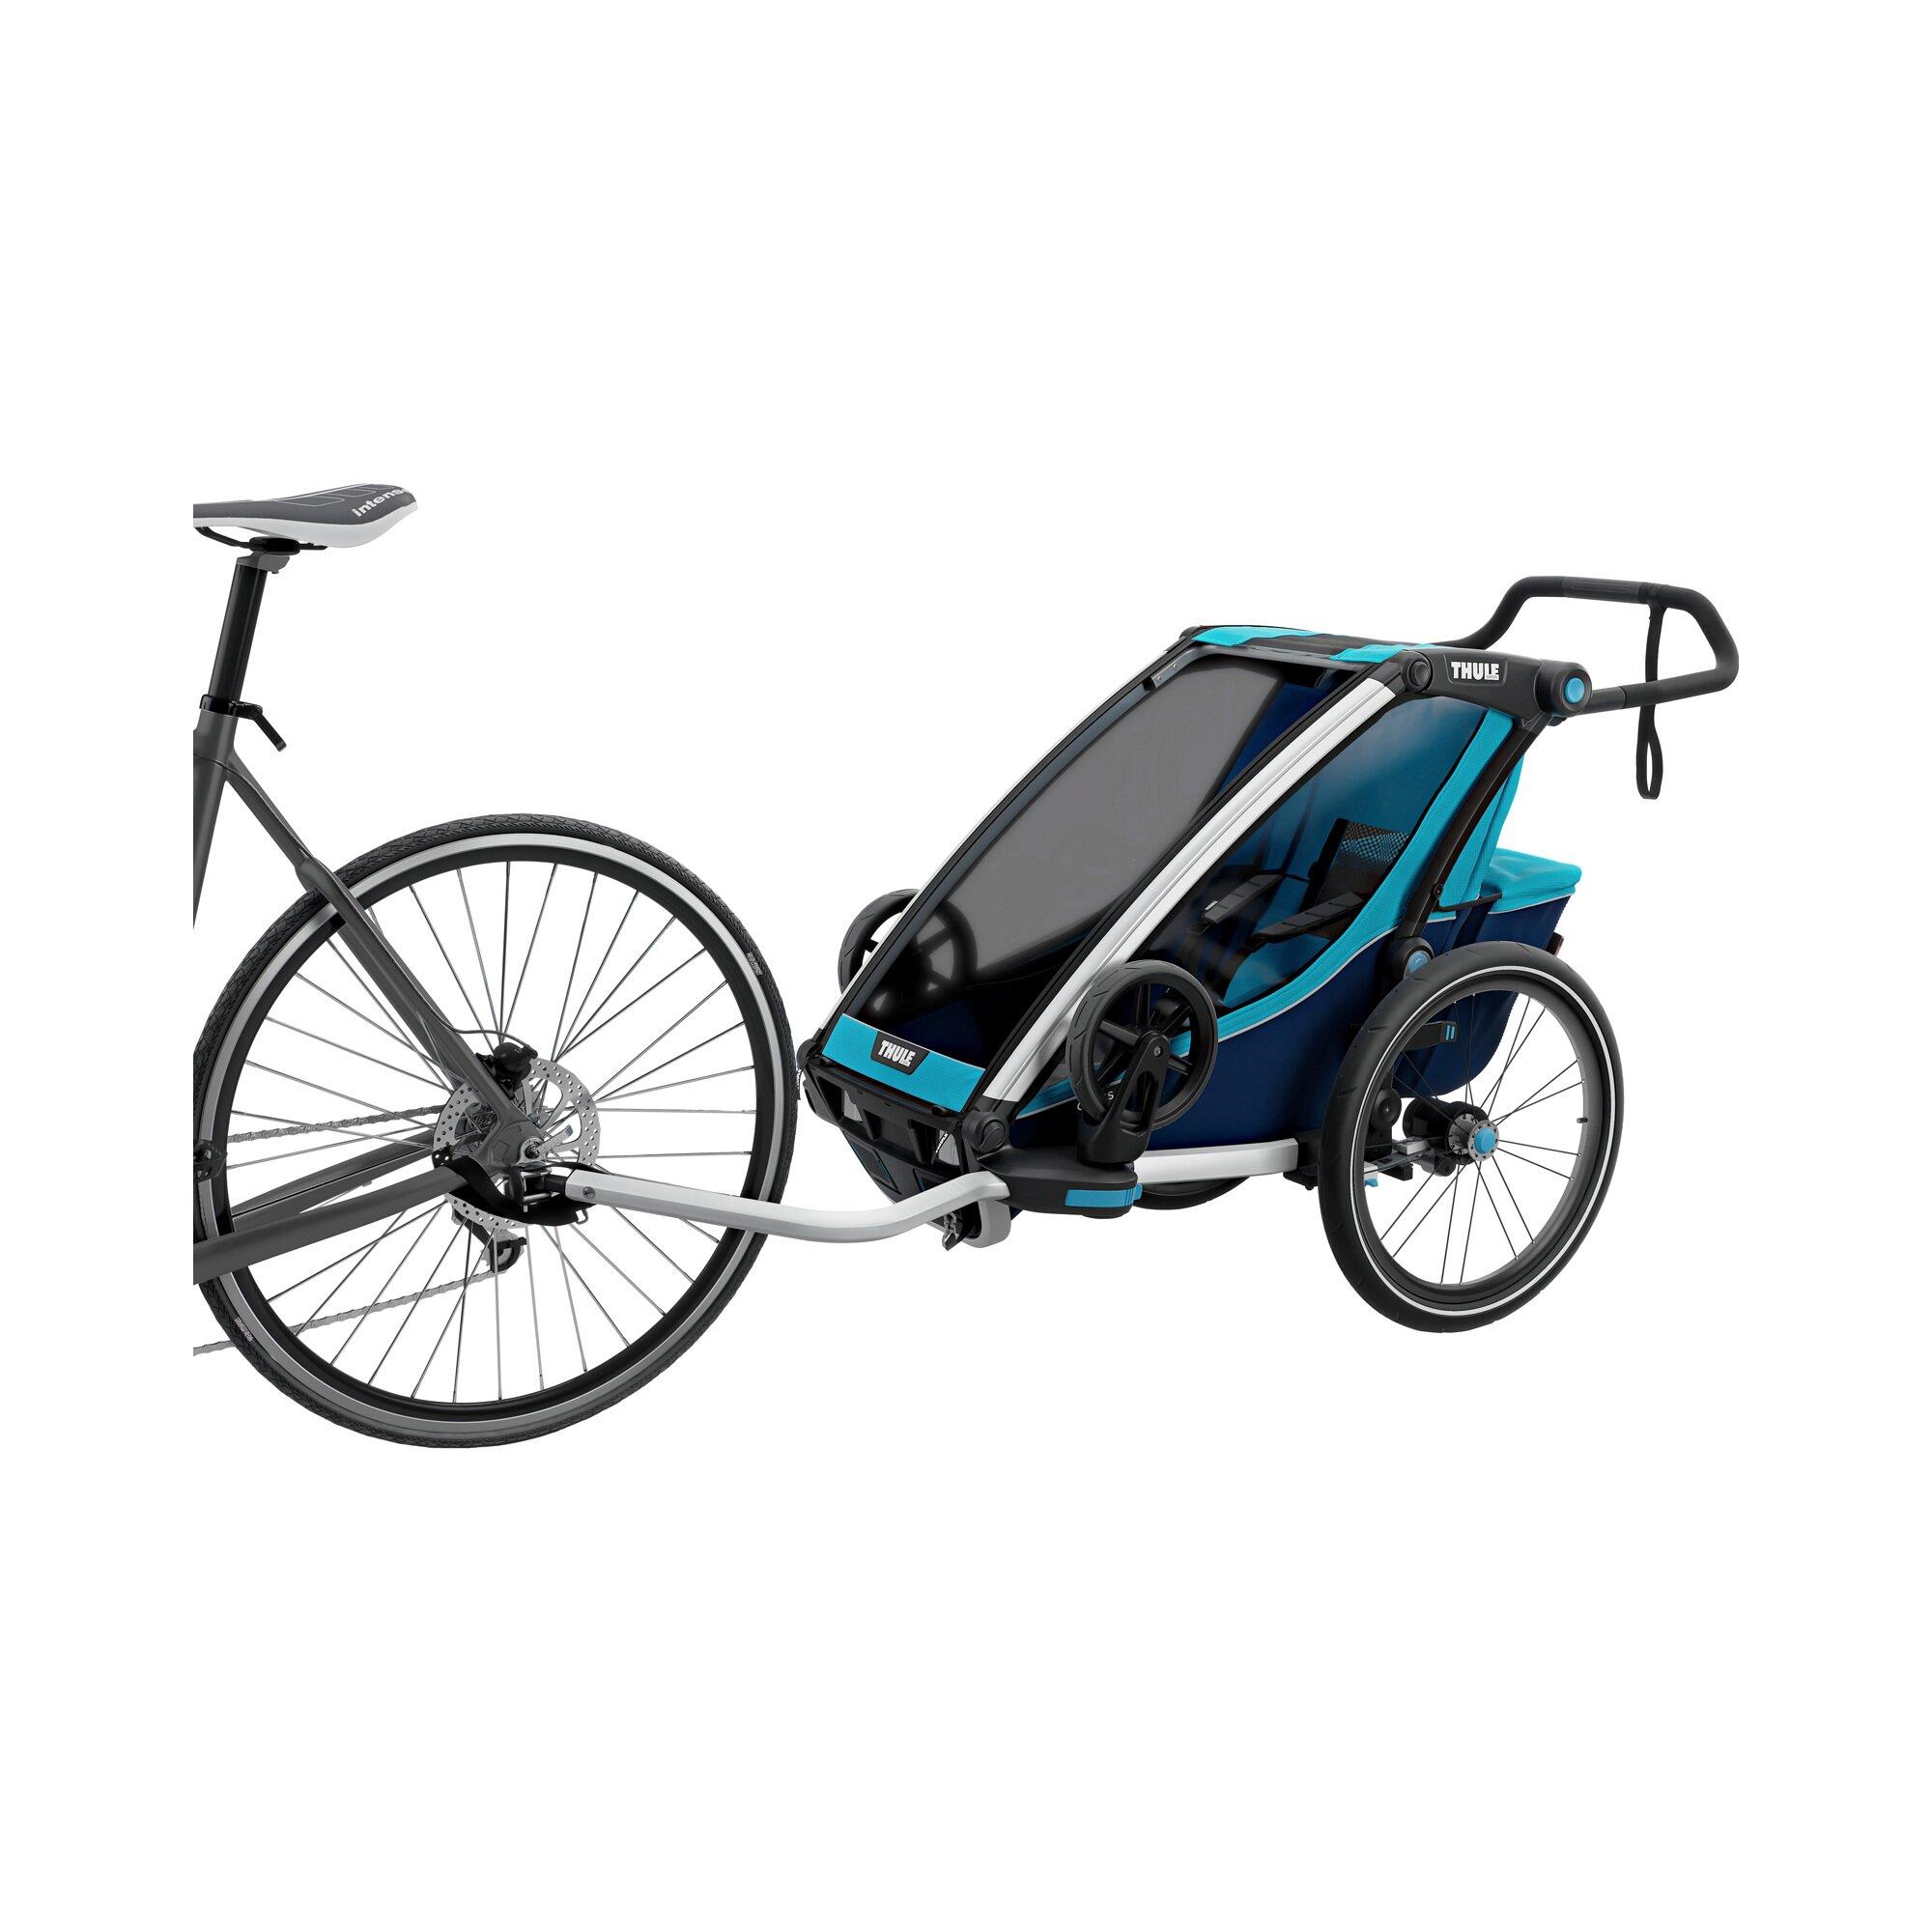 thule-chariot-cross1-fahrradanhanger